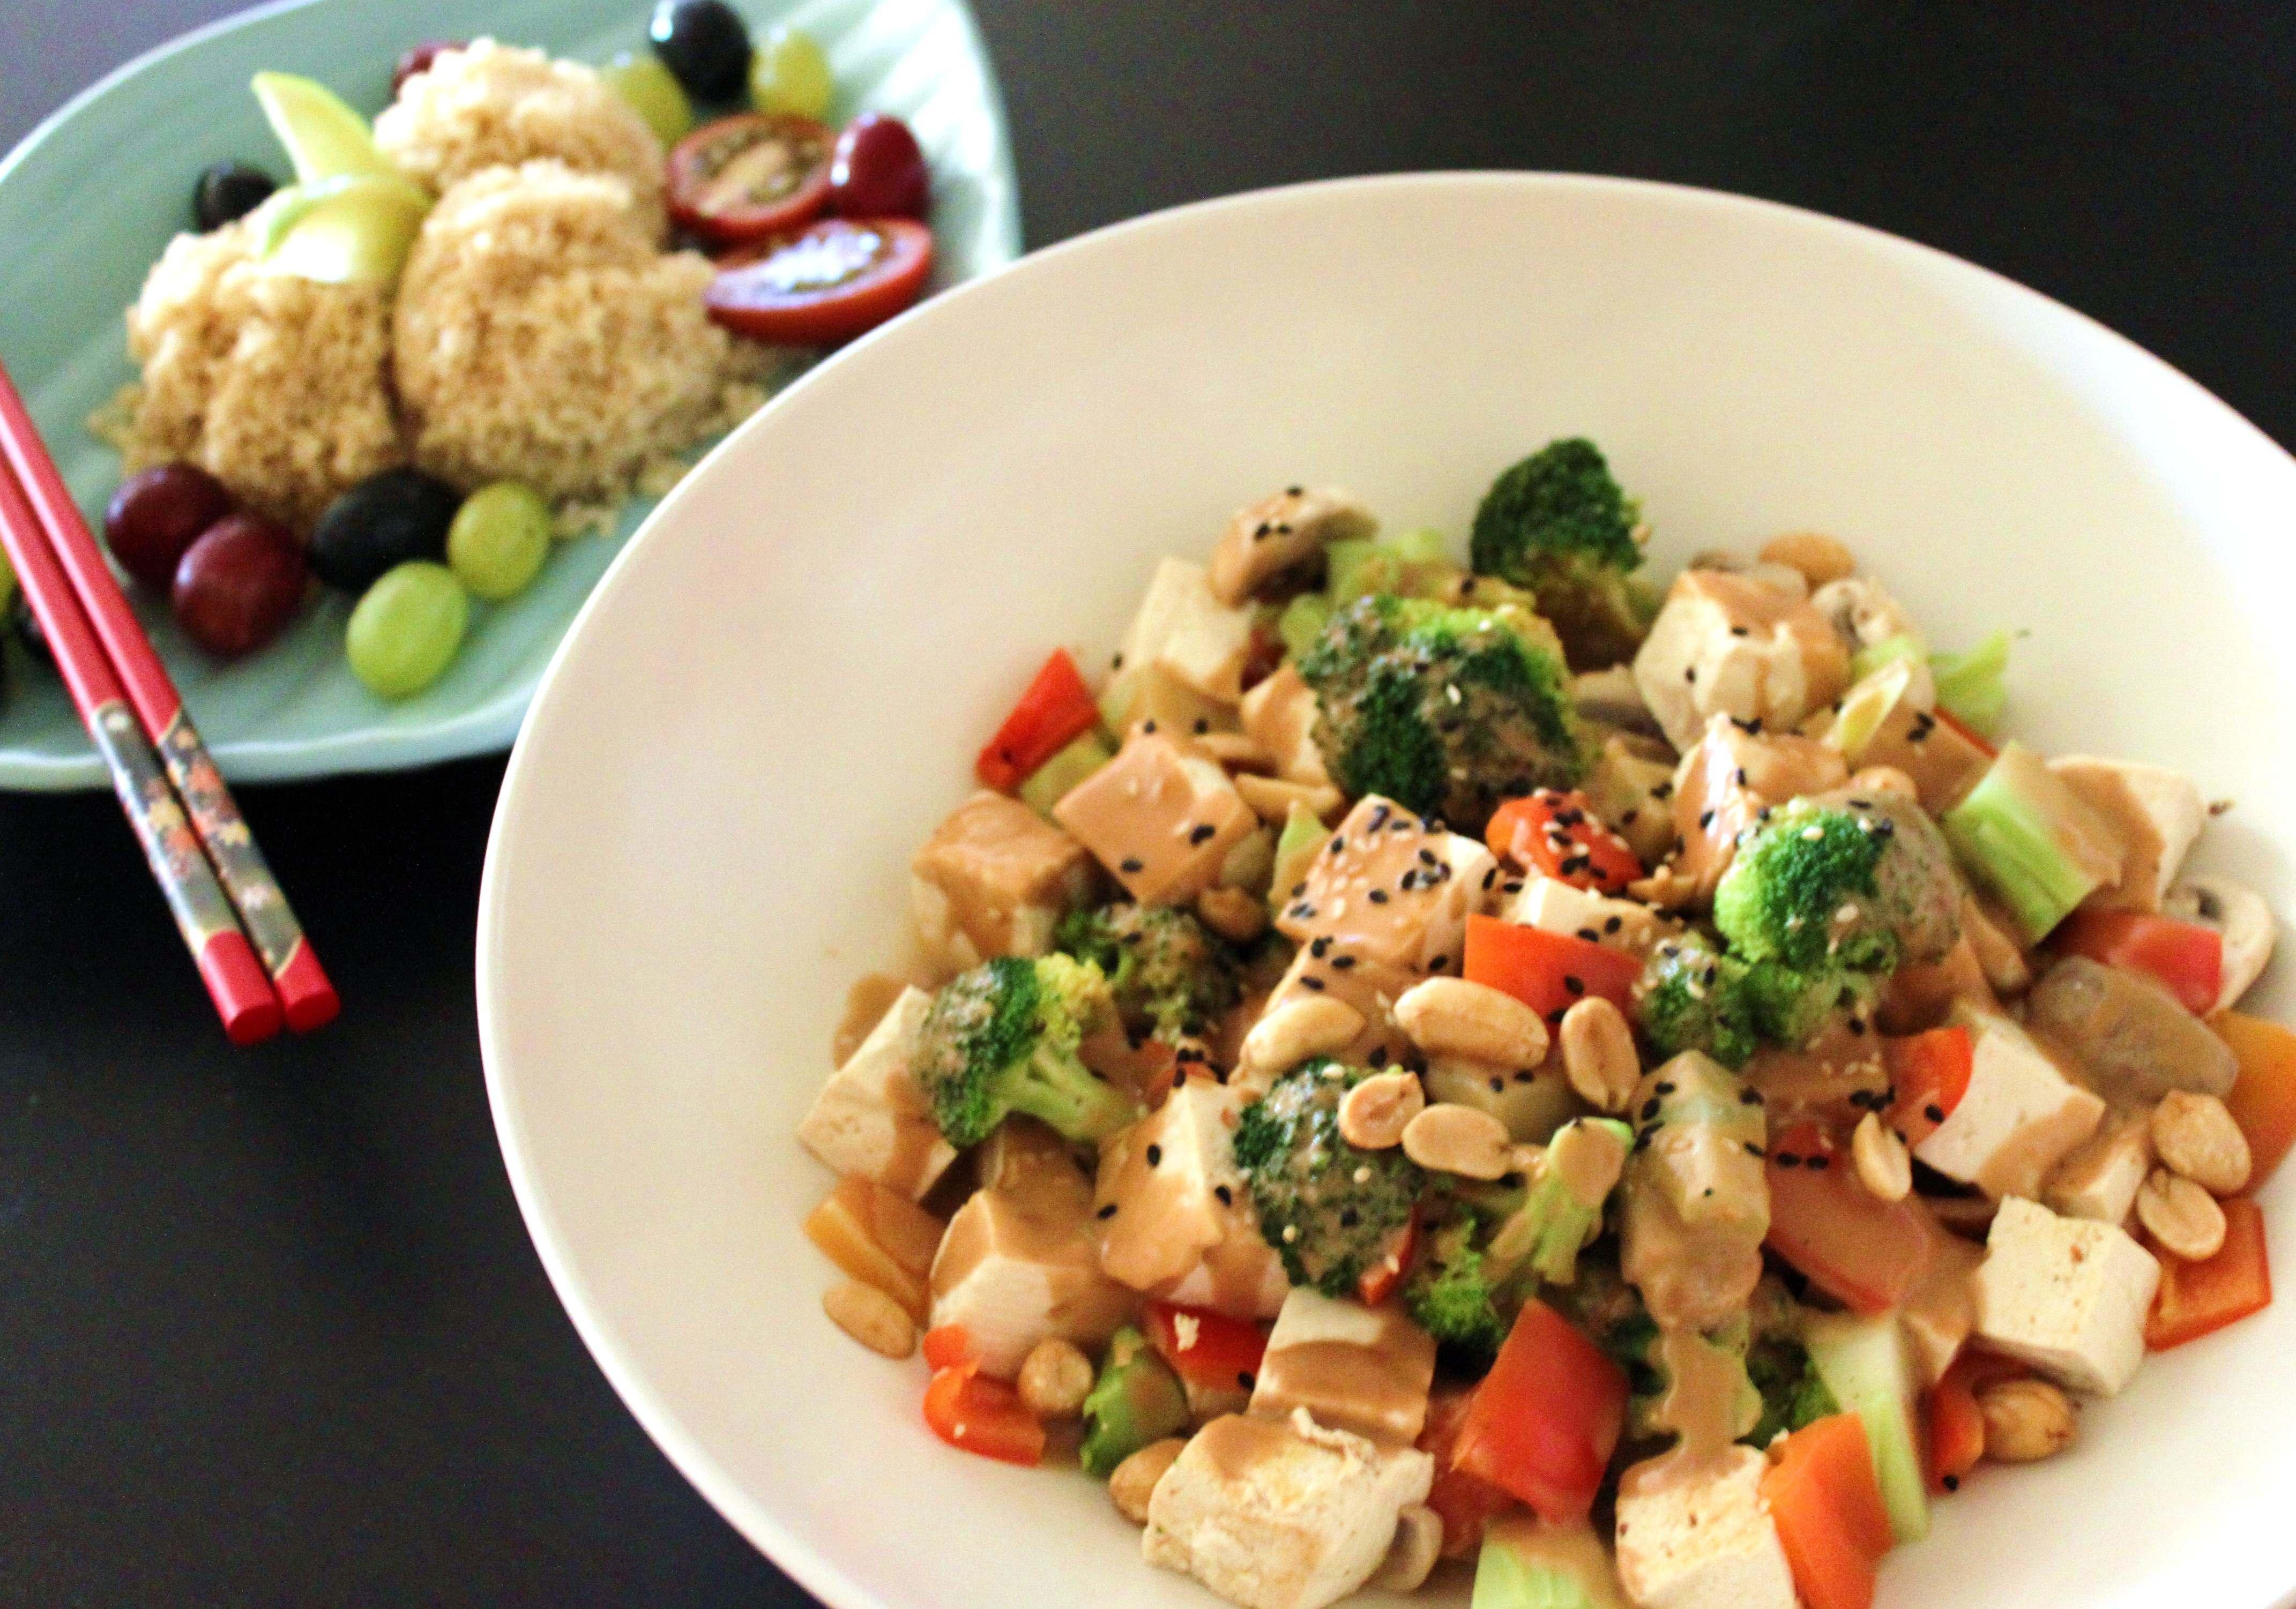 ... braised tofu in spicy sesame peanut sauce tofu stir fry tofu stir fry